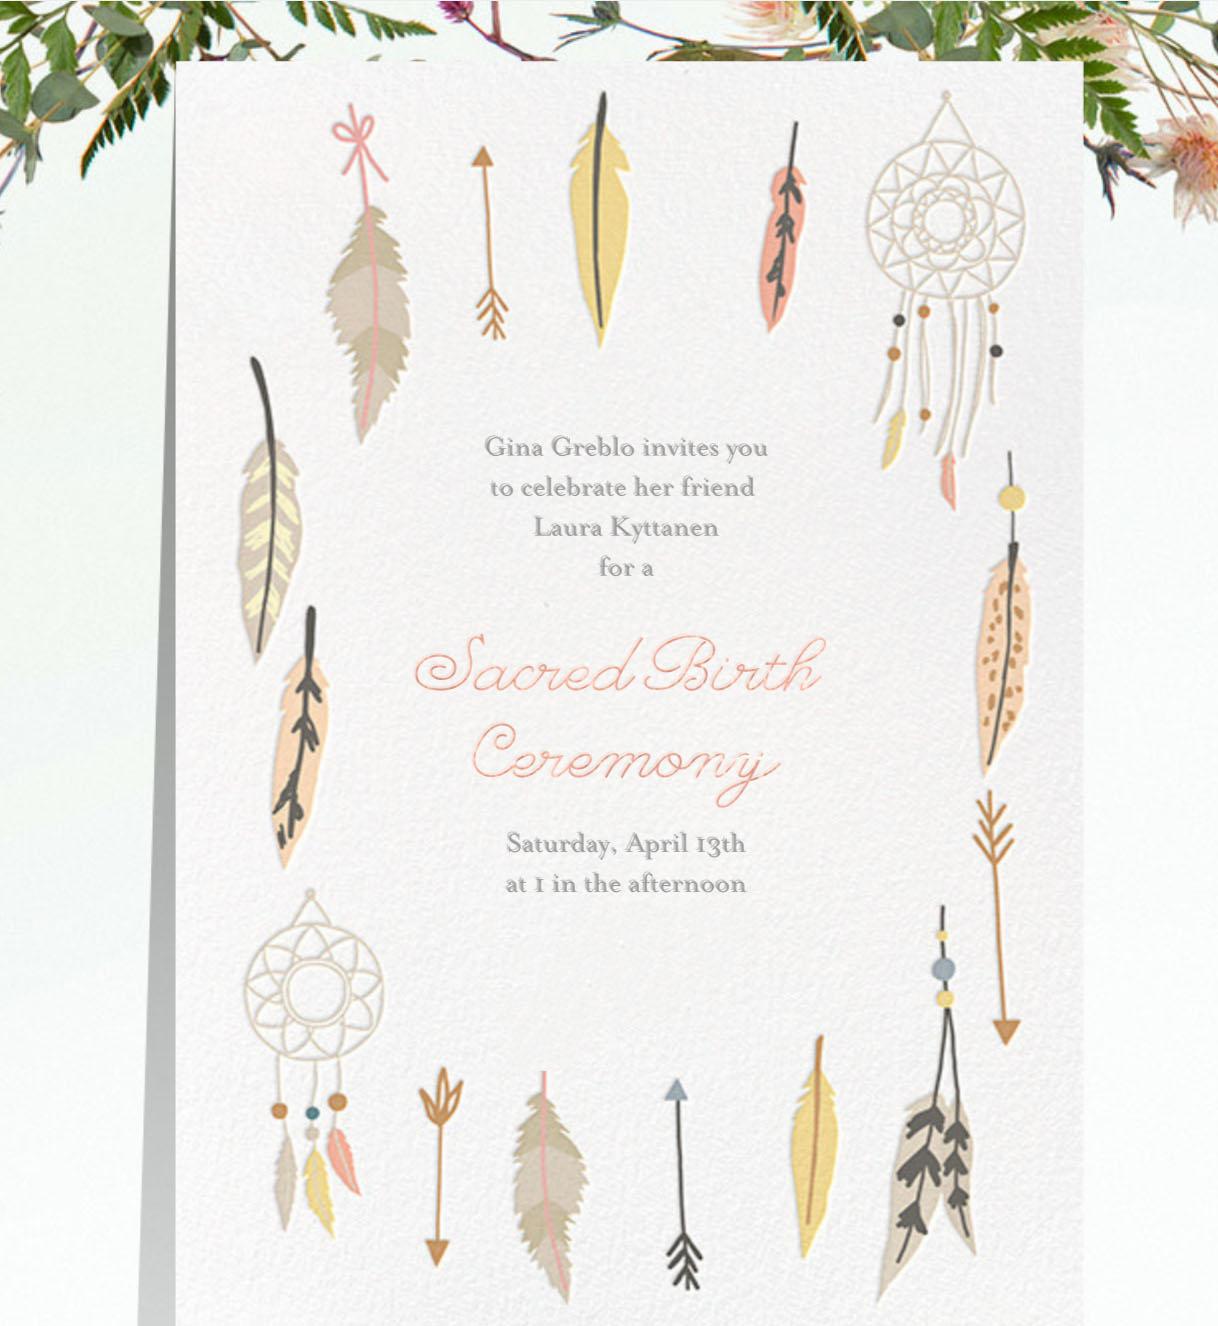 Invitation created using    Paperless post